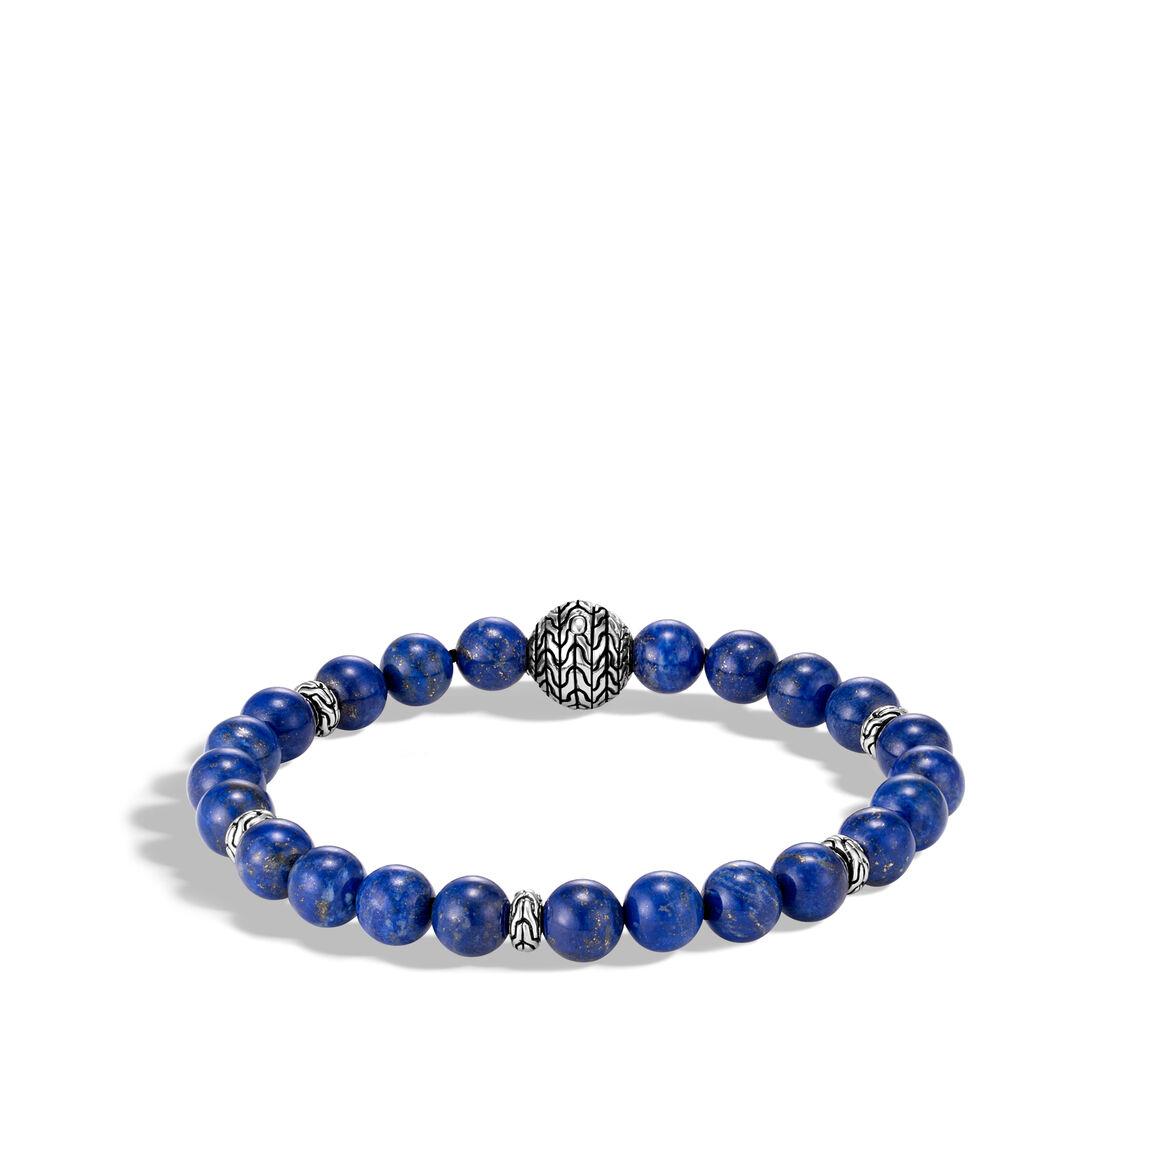 Classic Chain Bead Bracelet, Silver, 8MM Gemstone